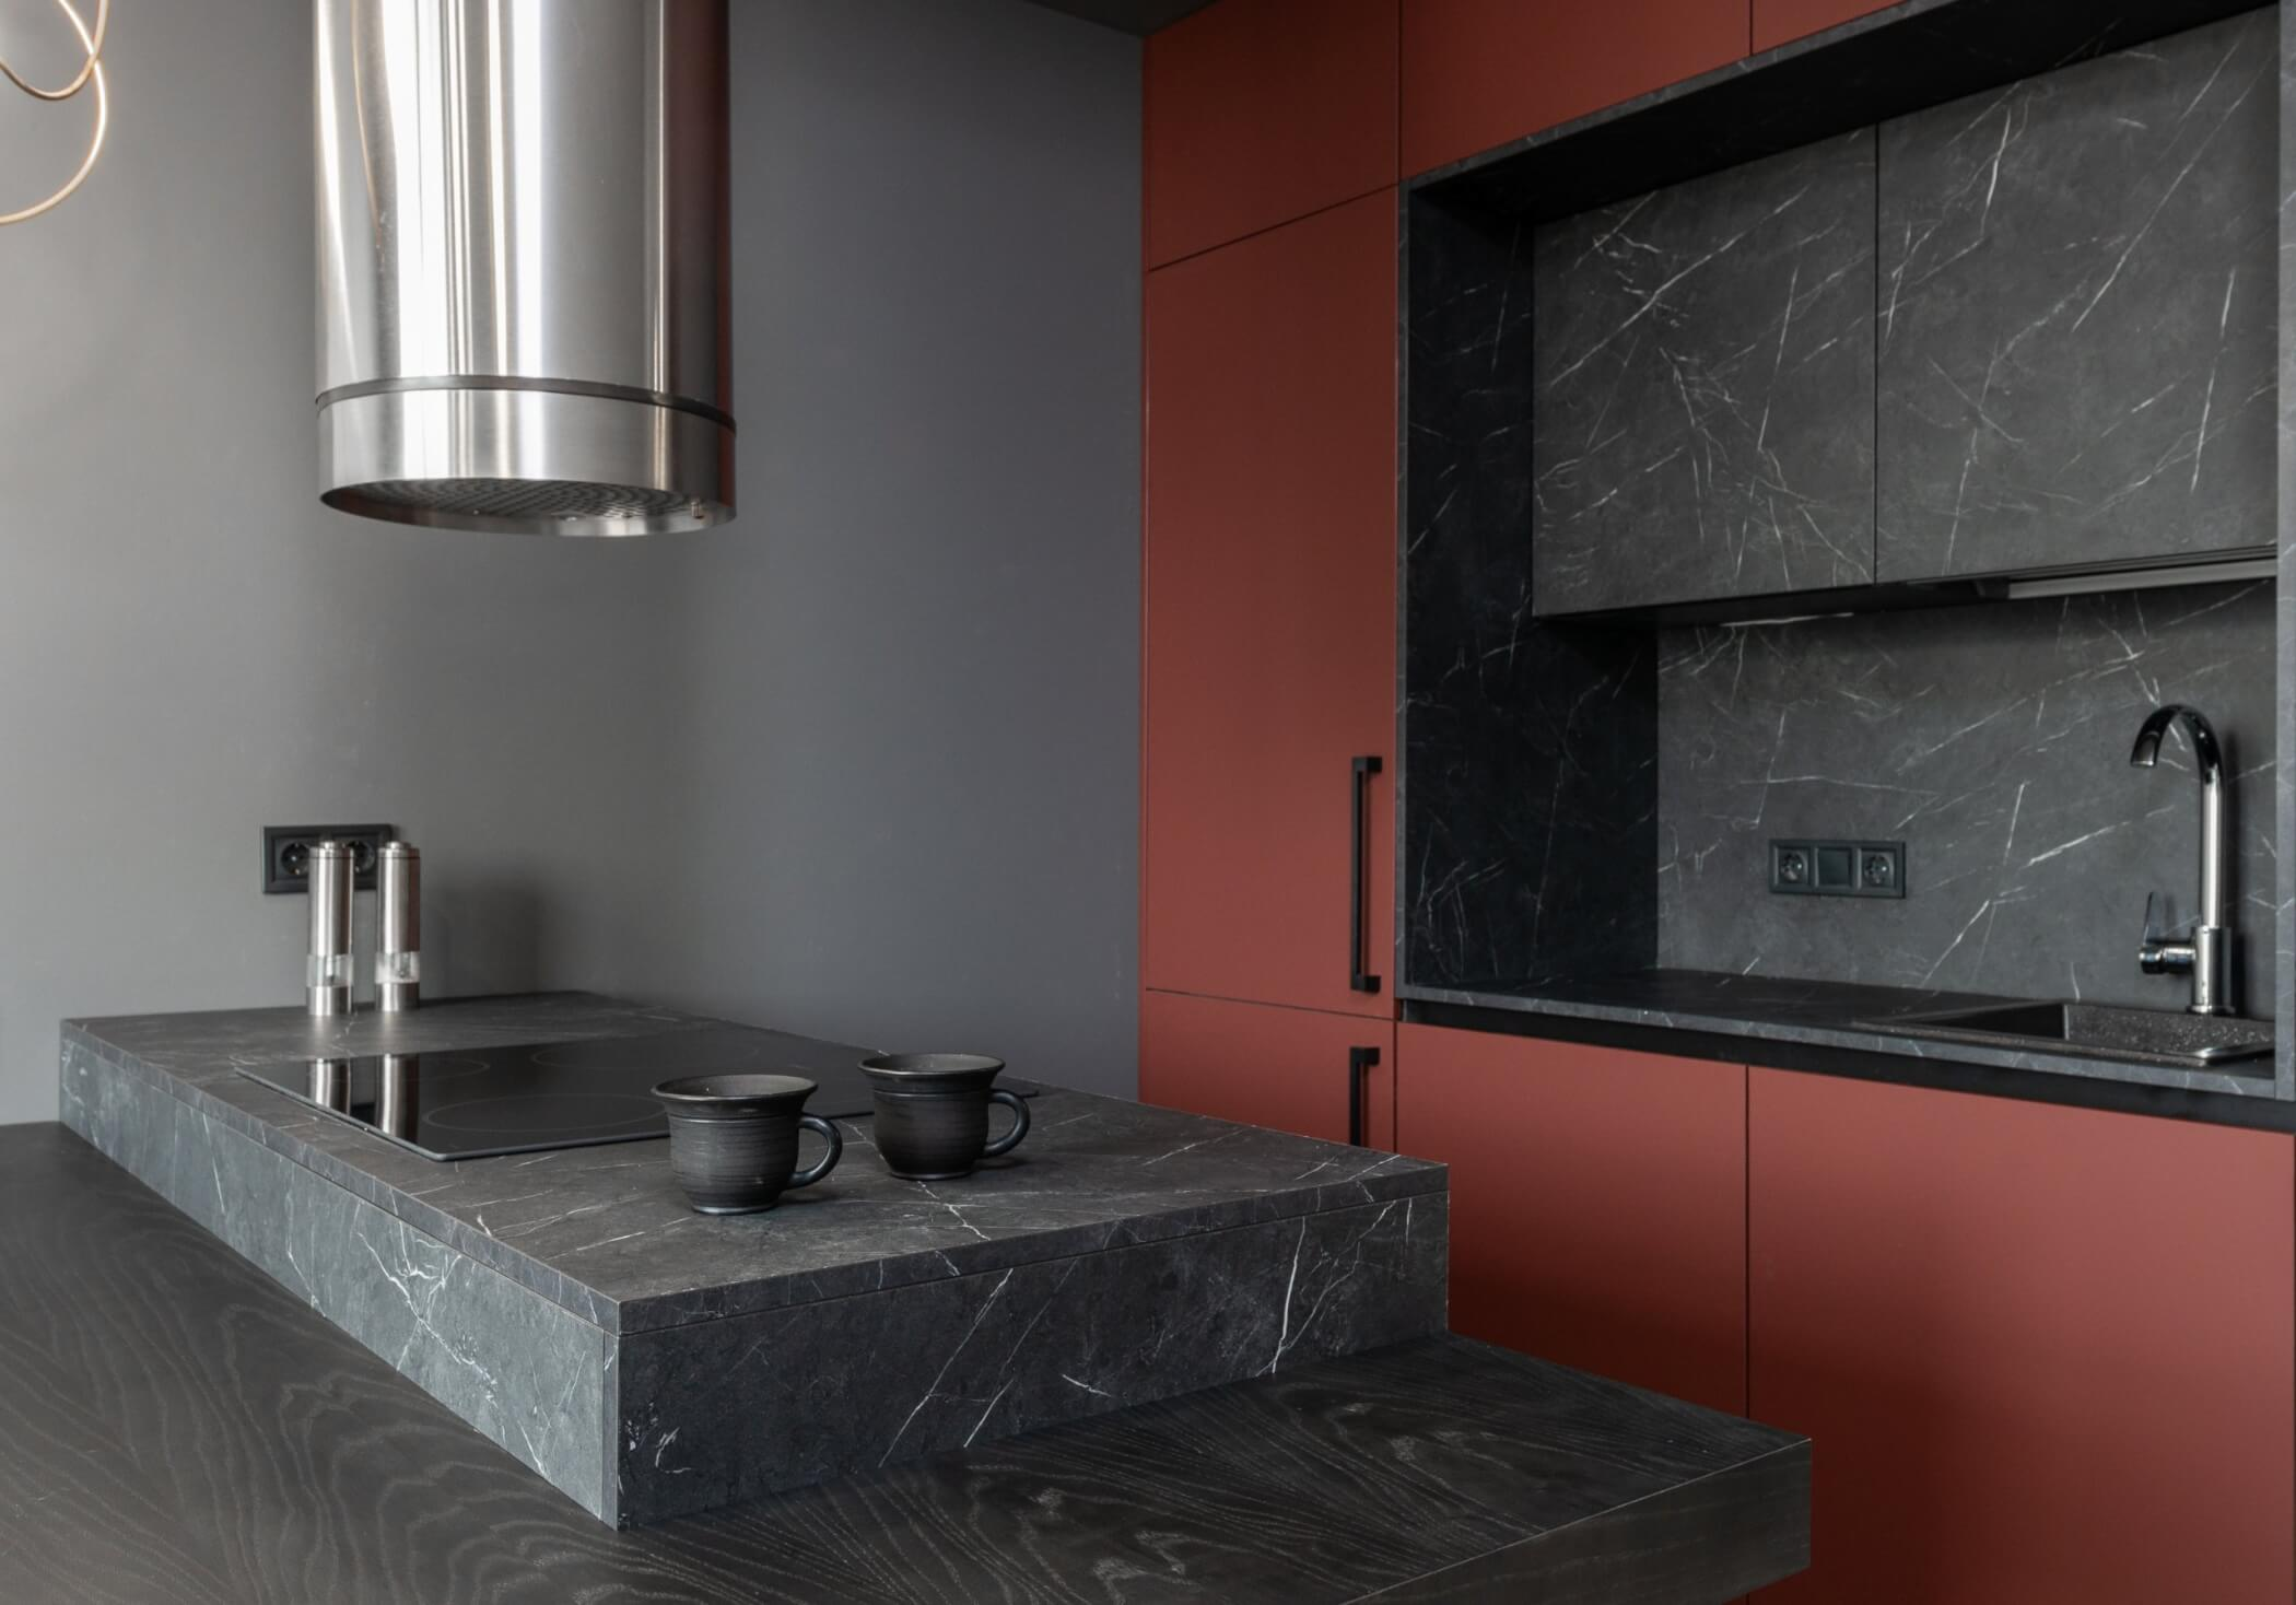 soapstone-kitchen-countertop-material